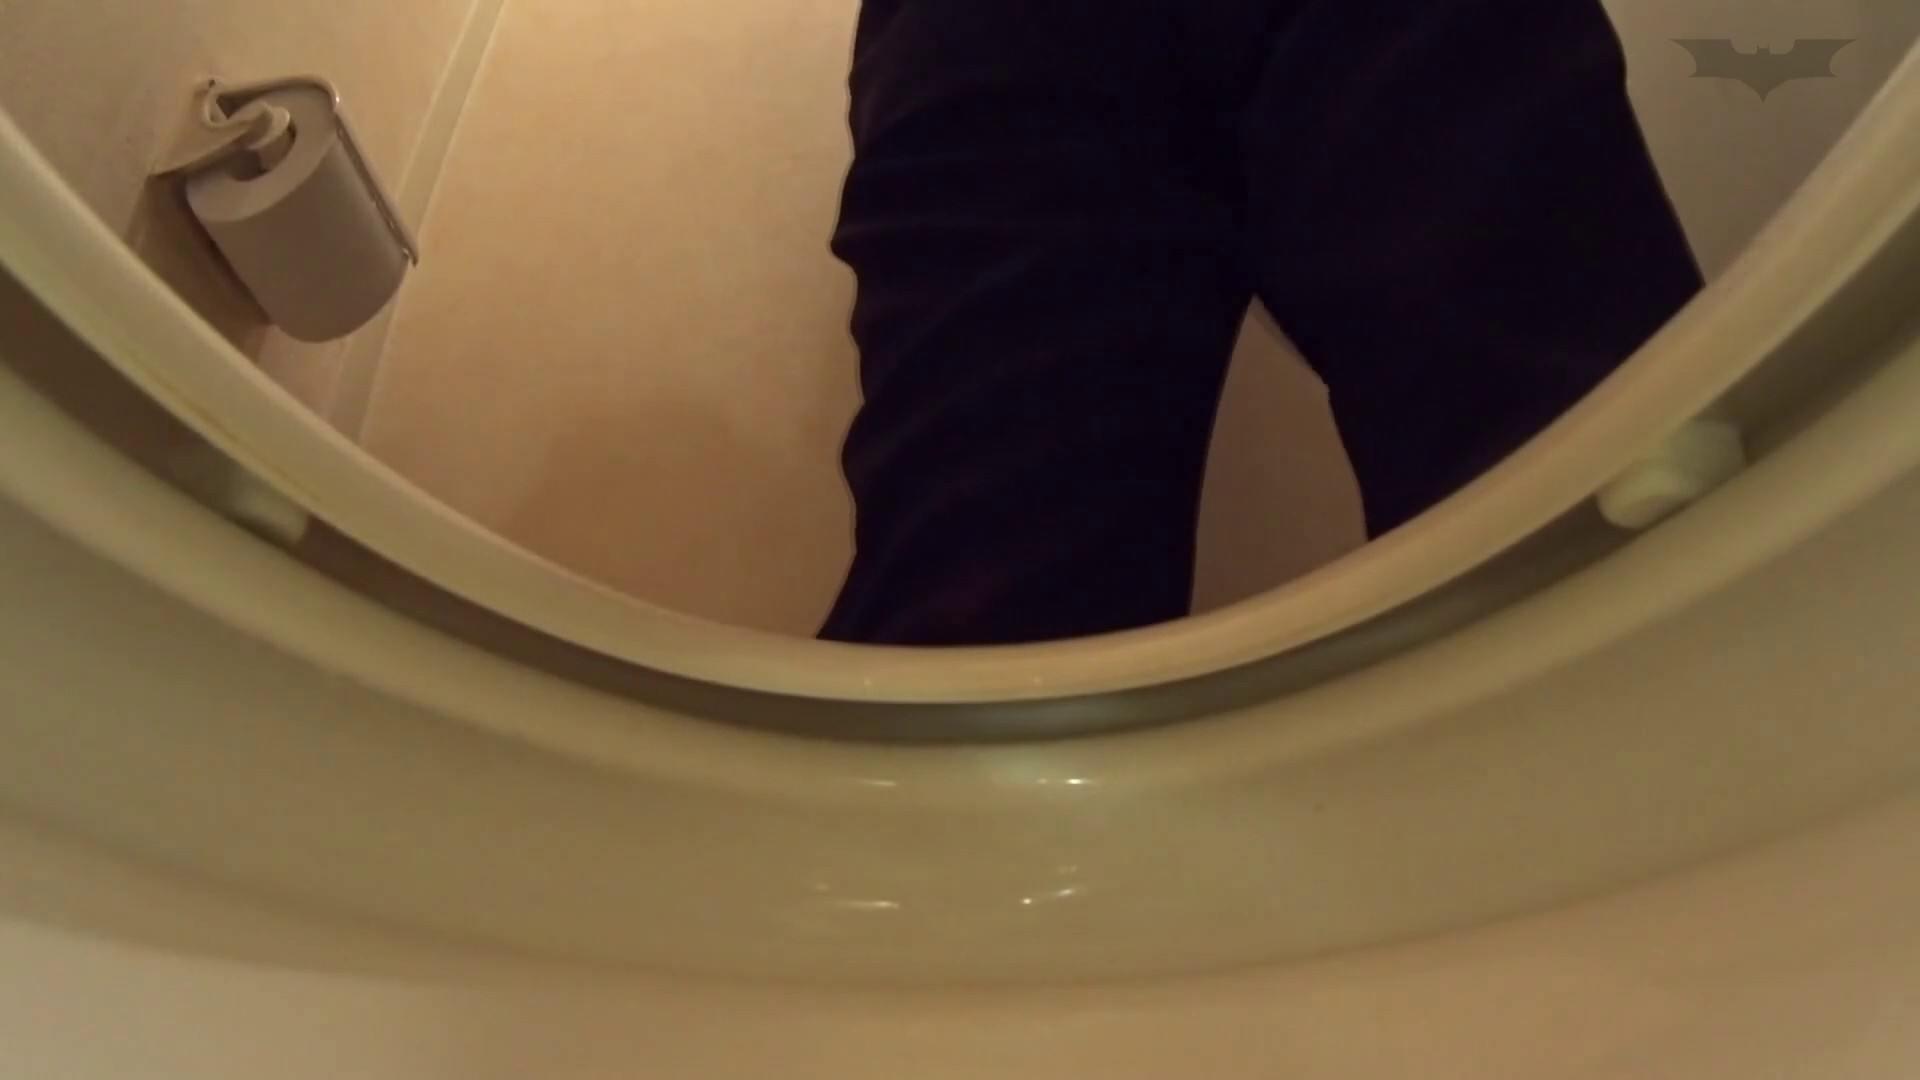 vol.04[洗面所]実はコレが目的でした。-脱糞美人お女市さまと巨乳大学生- 細身女性 オメコ動画キャプチャ 104画像 35